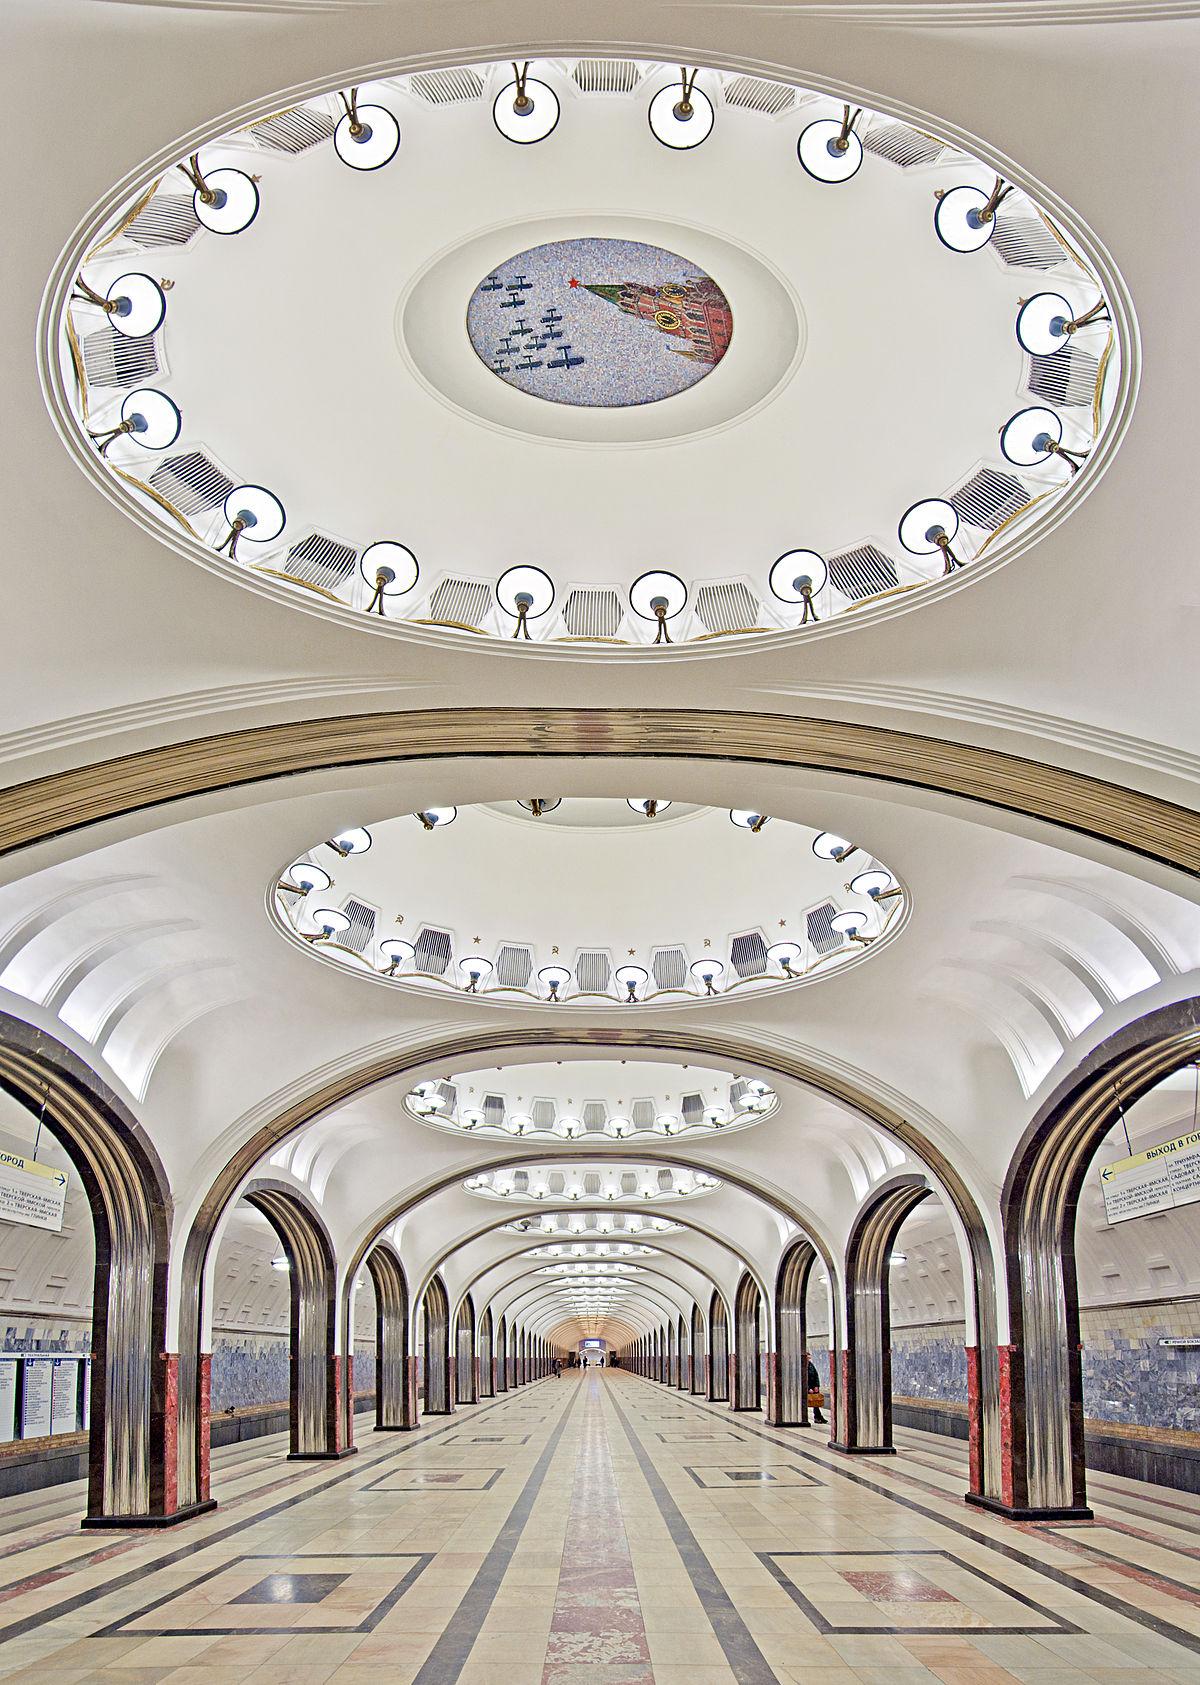 Mayakovskaya Moscow Metro Wikipedia - The 12 most beautiful metro stations in the world